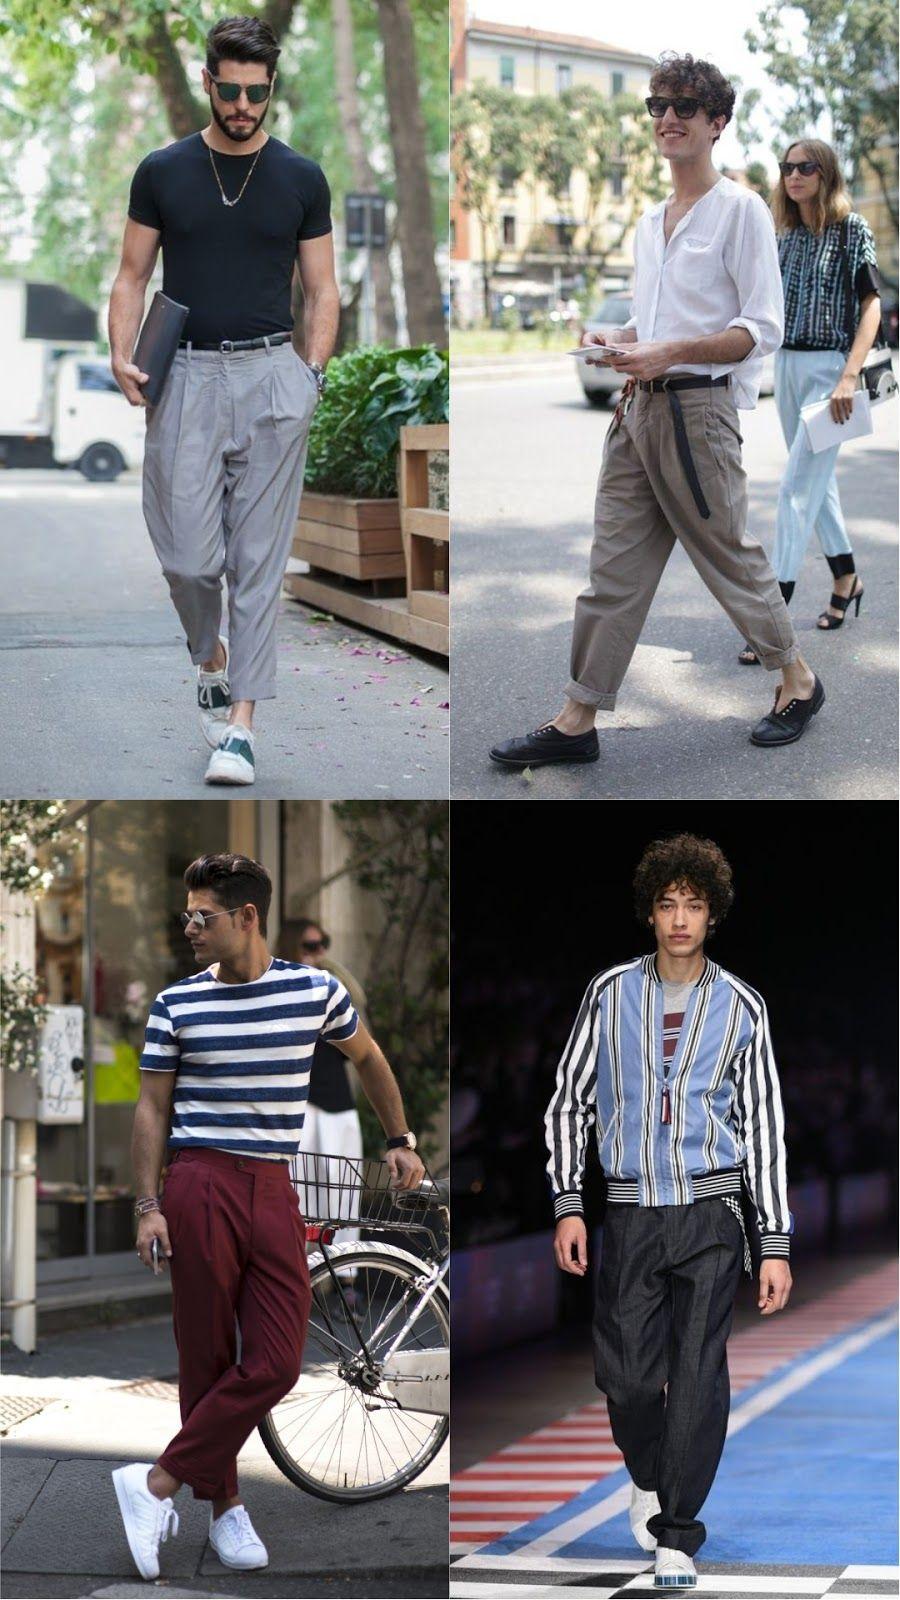 ff9459861c tendencias-moda-masculina-primavera-verao-2019 -blog-tres-chic-look-calcas-oversize